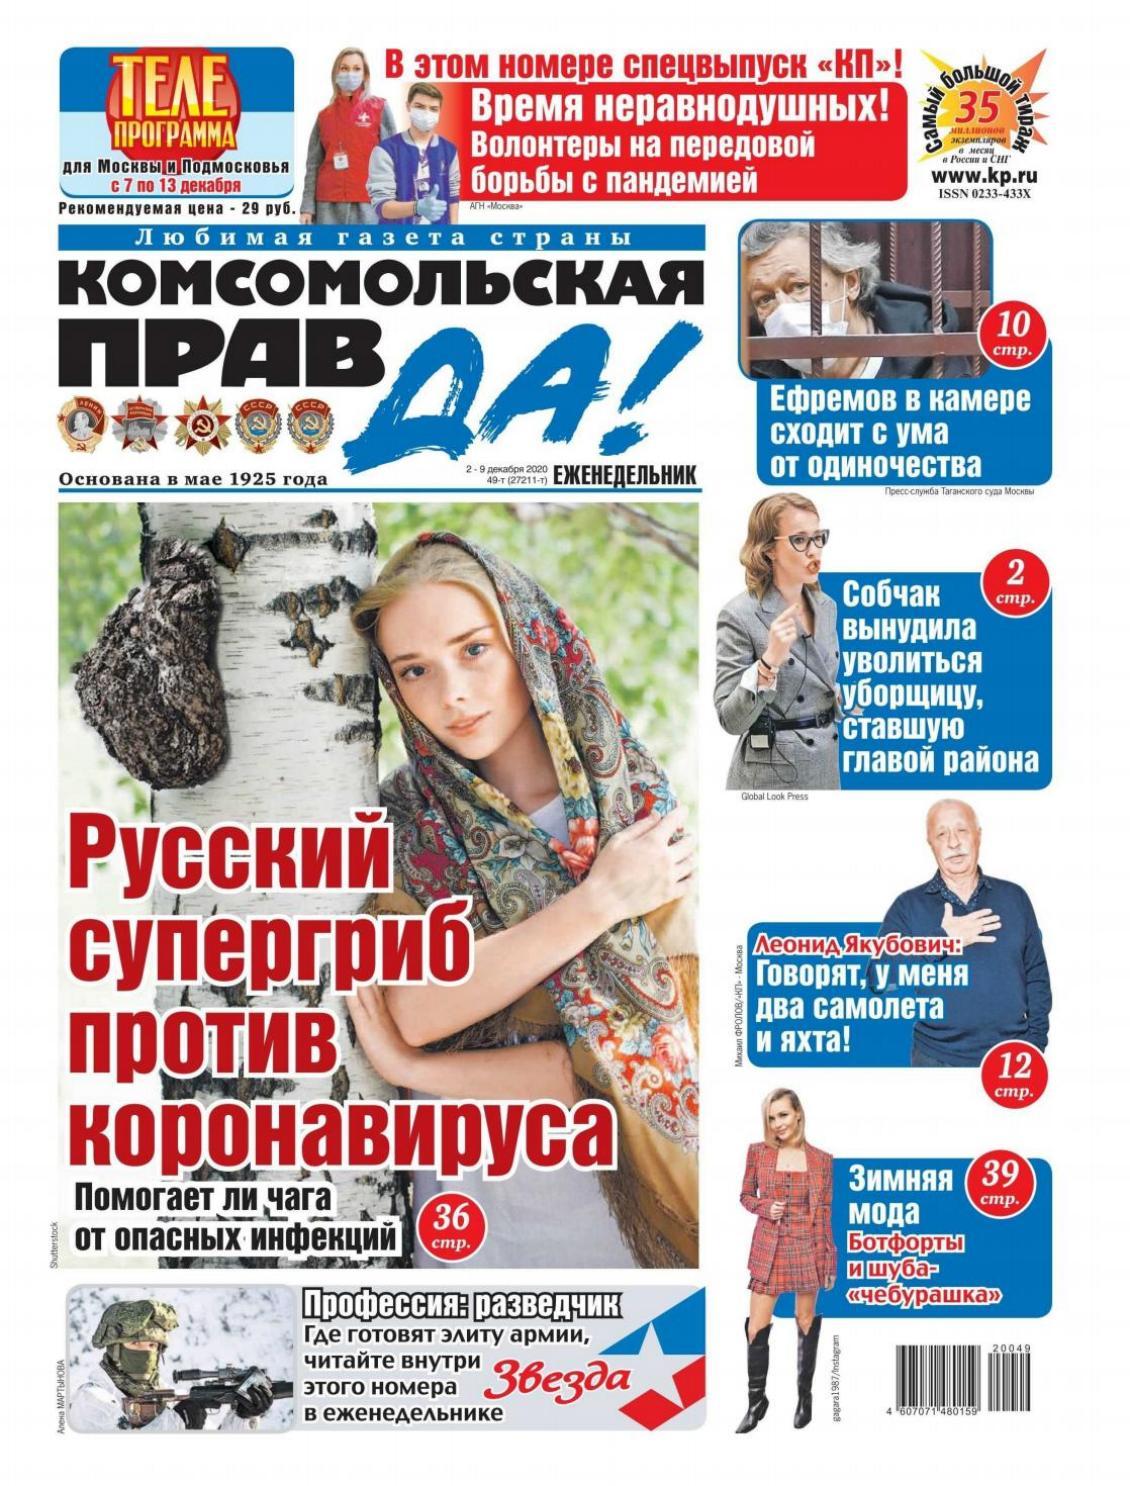 Комсомольская правда. Толстушка №49, декабрь 2020